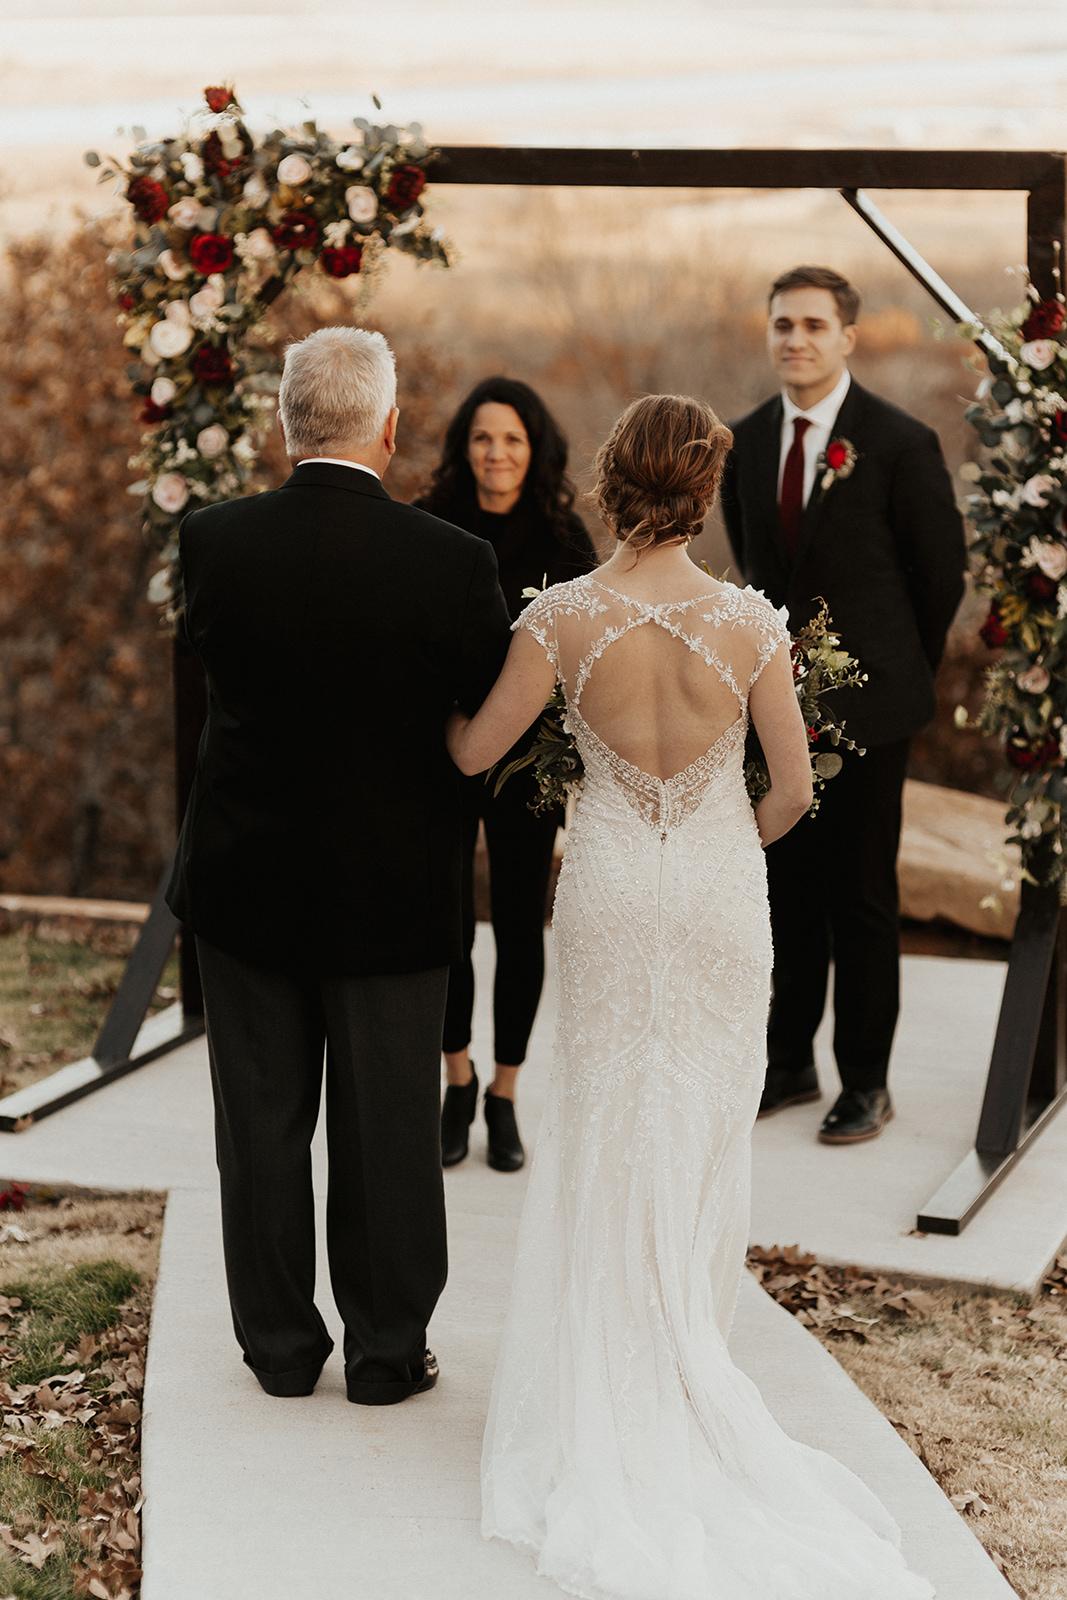 Best Wedding Venue in Tulsa Bixby Dream Point Ranch 48.jpg